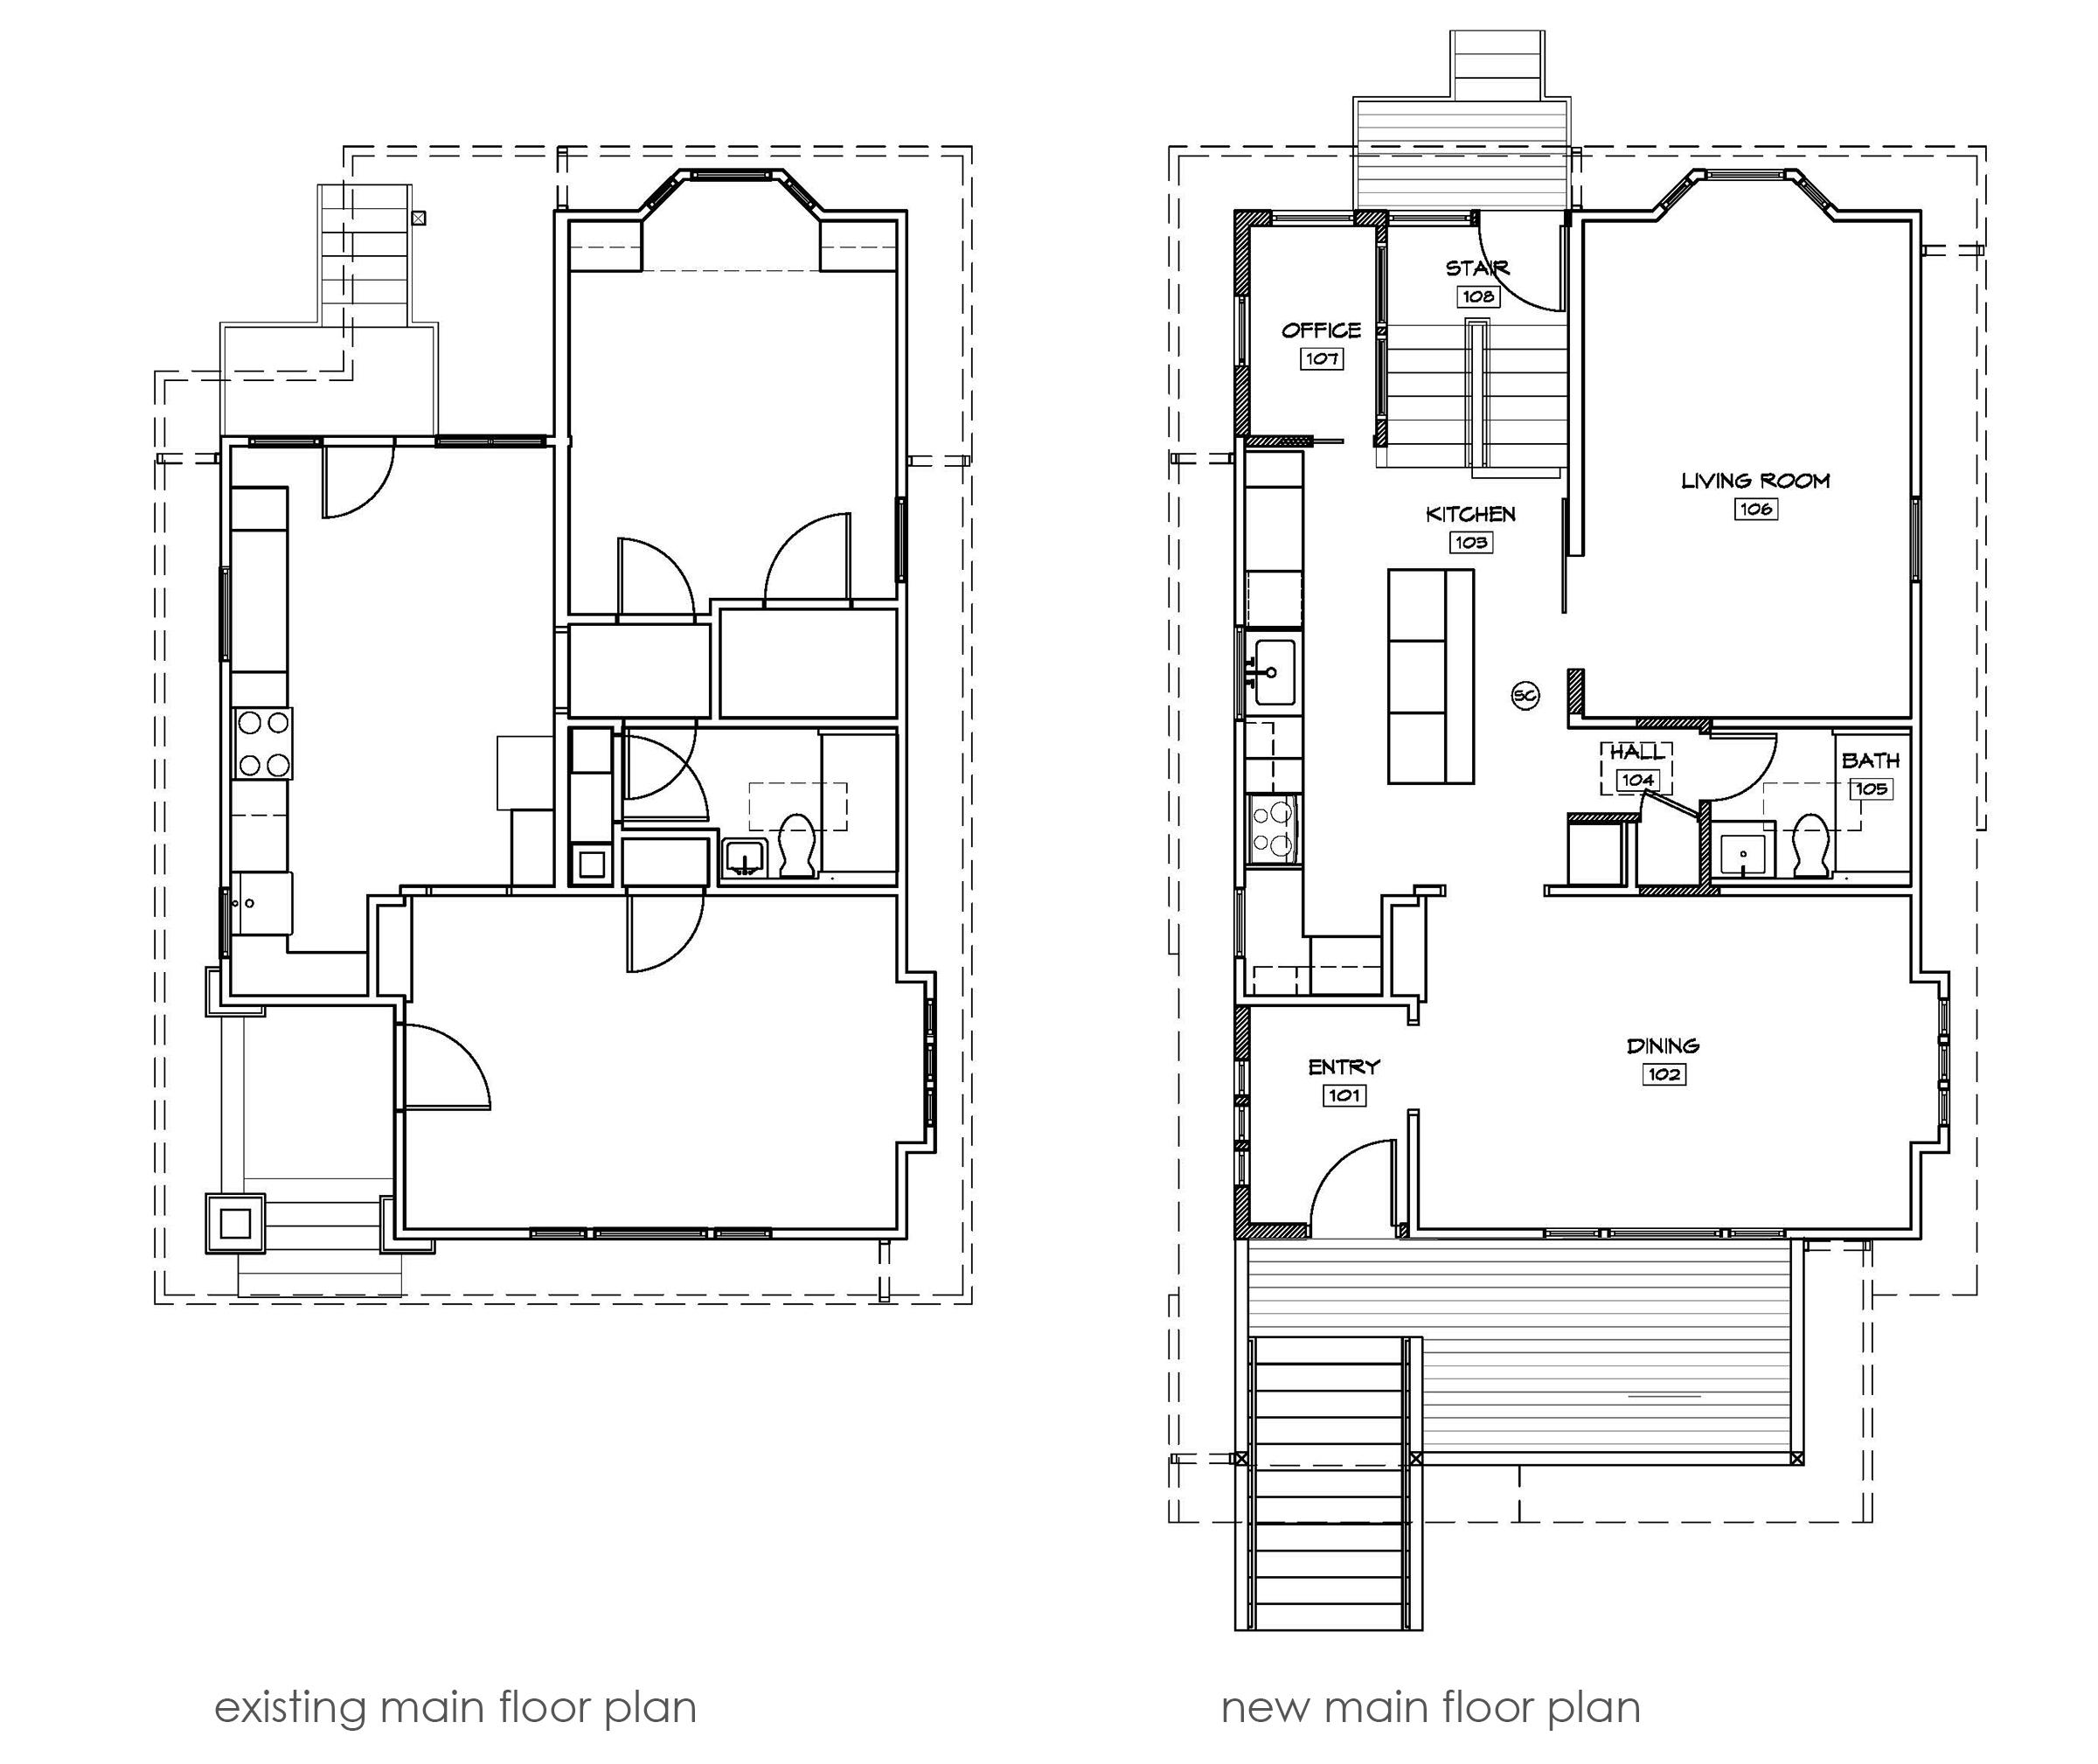 studio zerbey / seattle house lift : CHEZERBEY